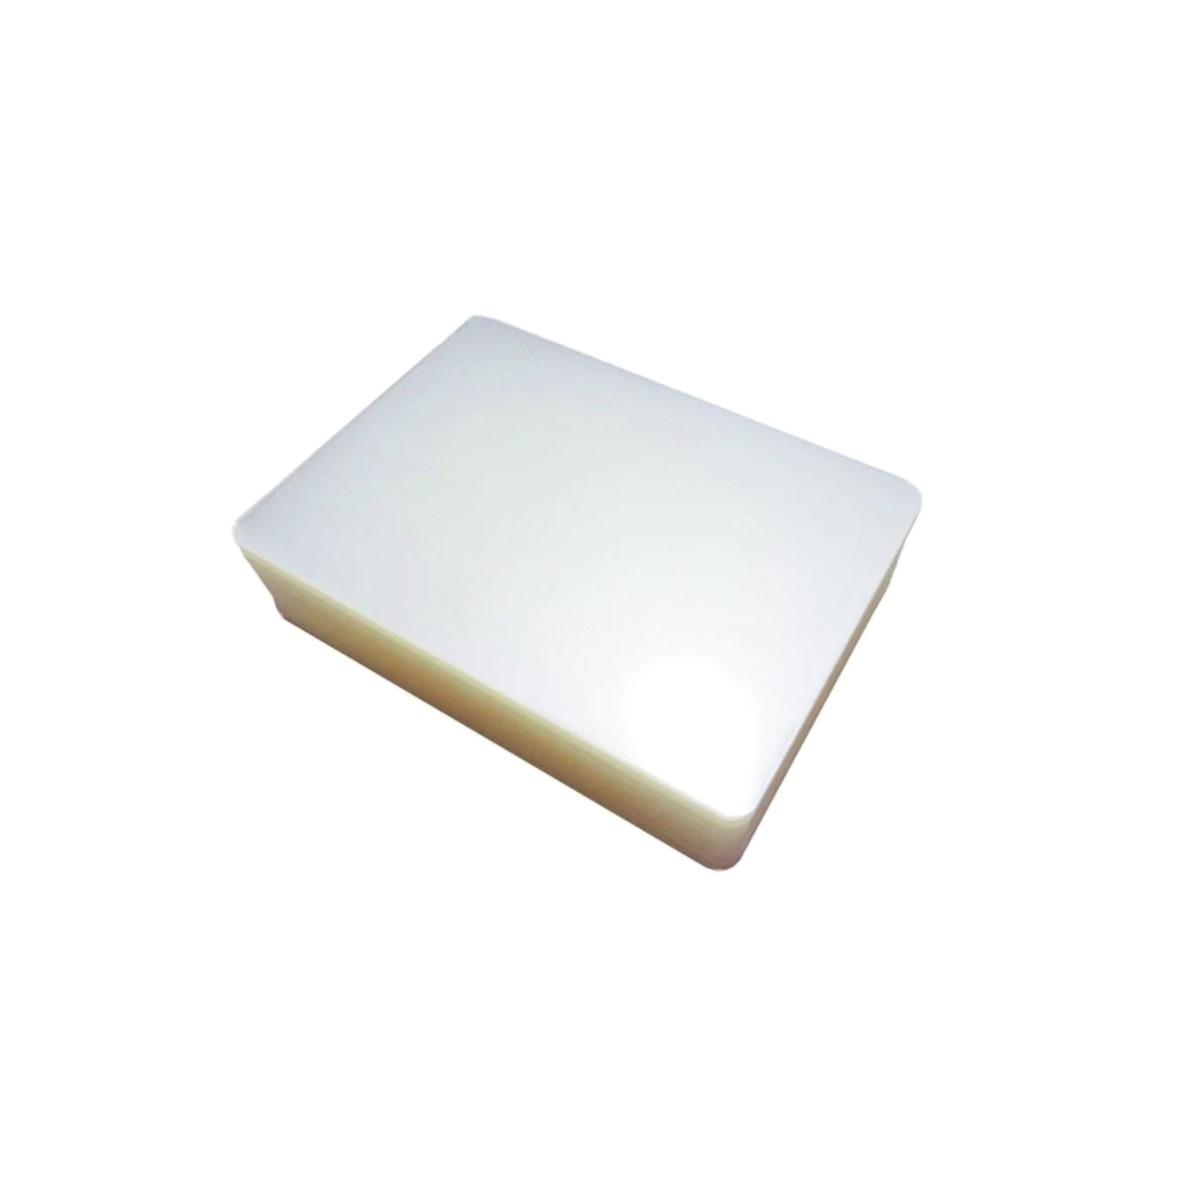 Polaseal plástico para plastificação Ofício II 222x336 0,07mm 100un